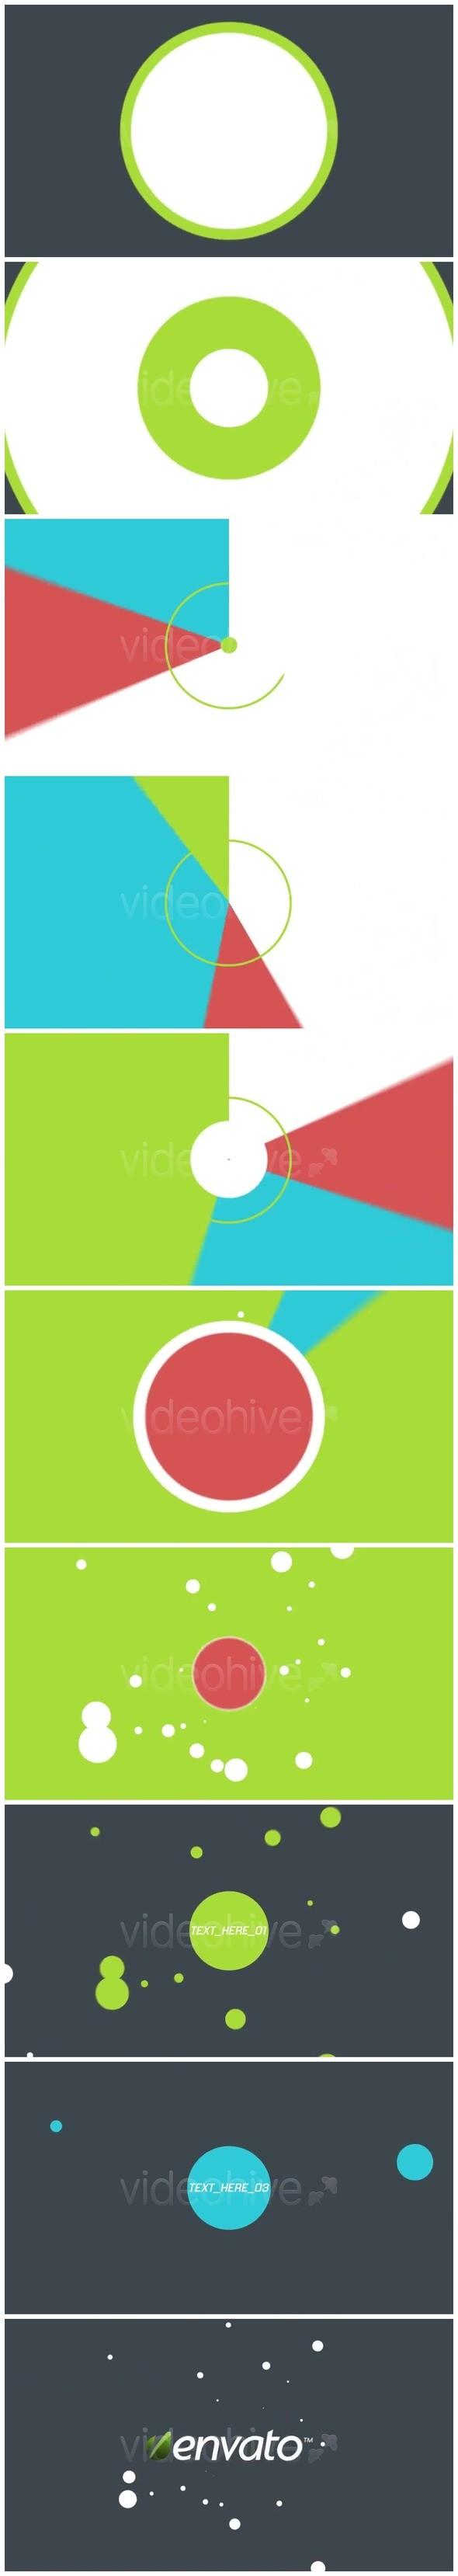 Videohive - Opening Logo 4356338